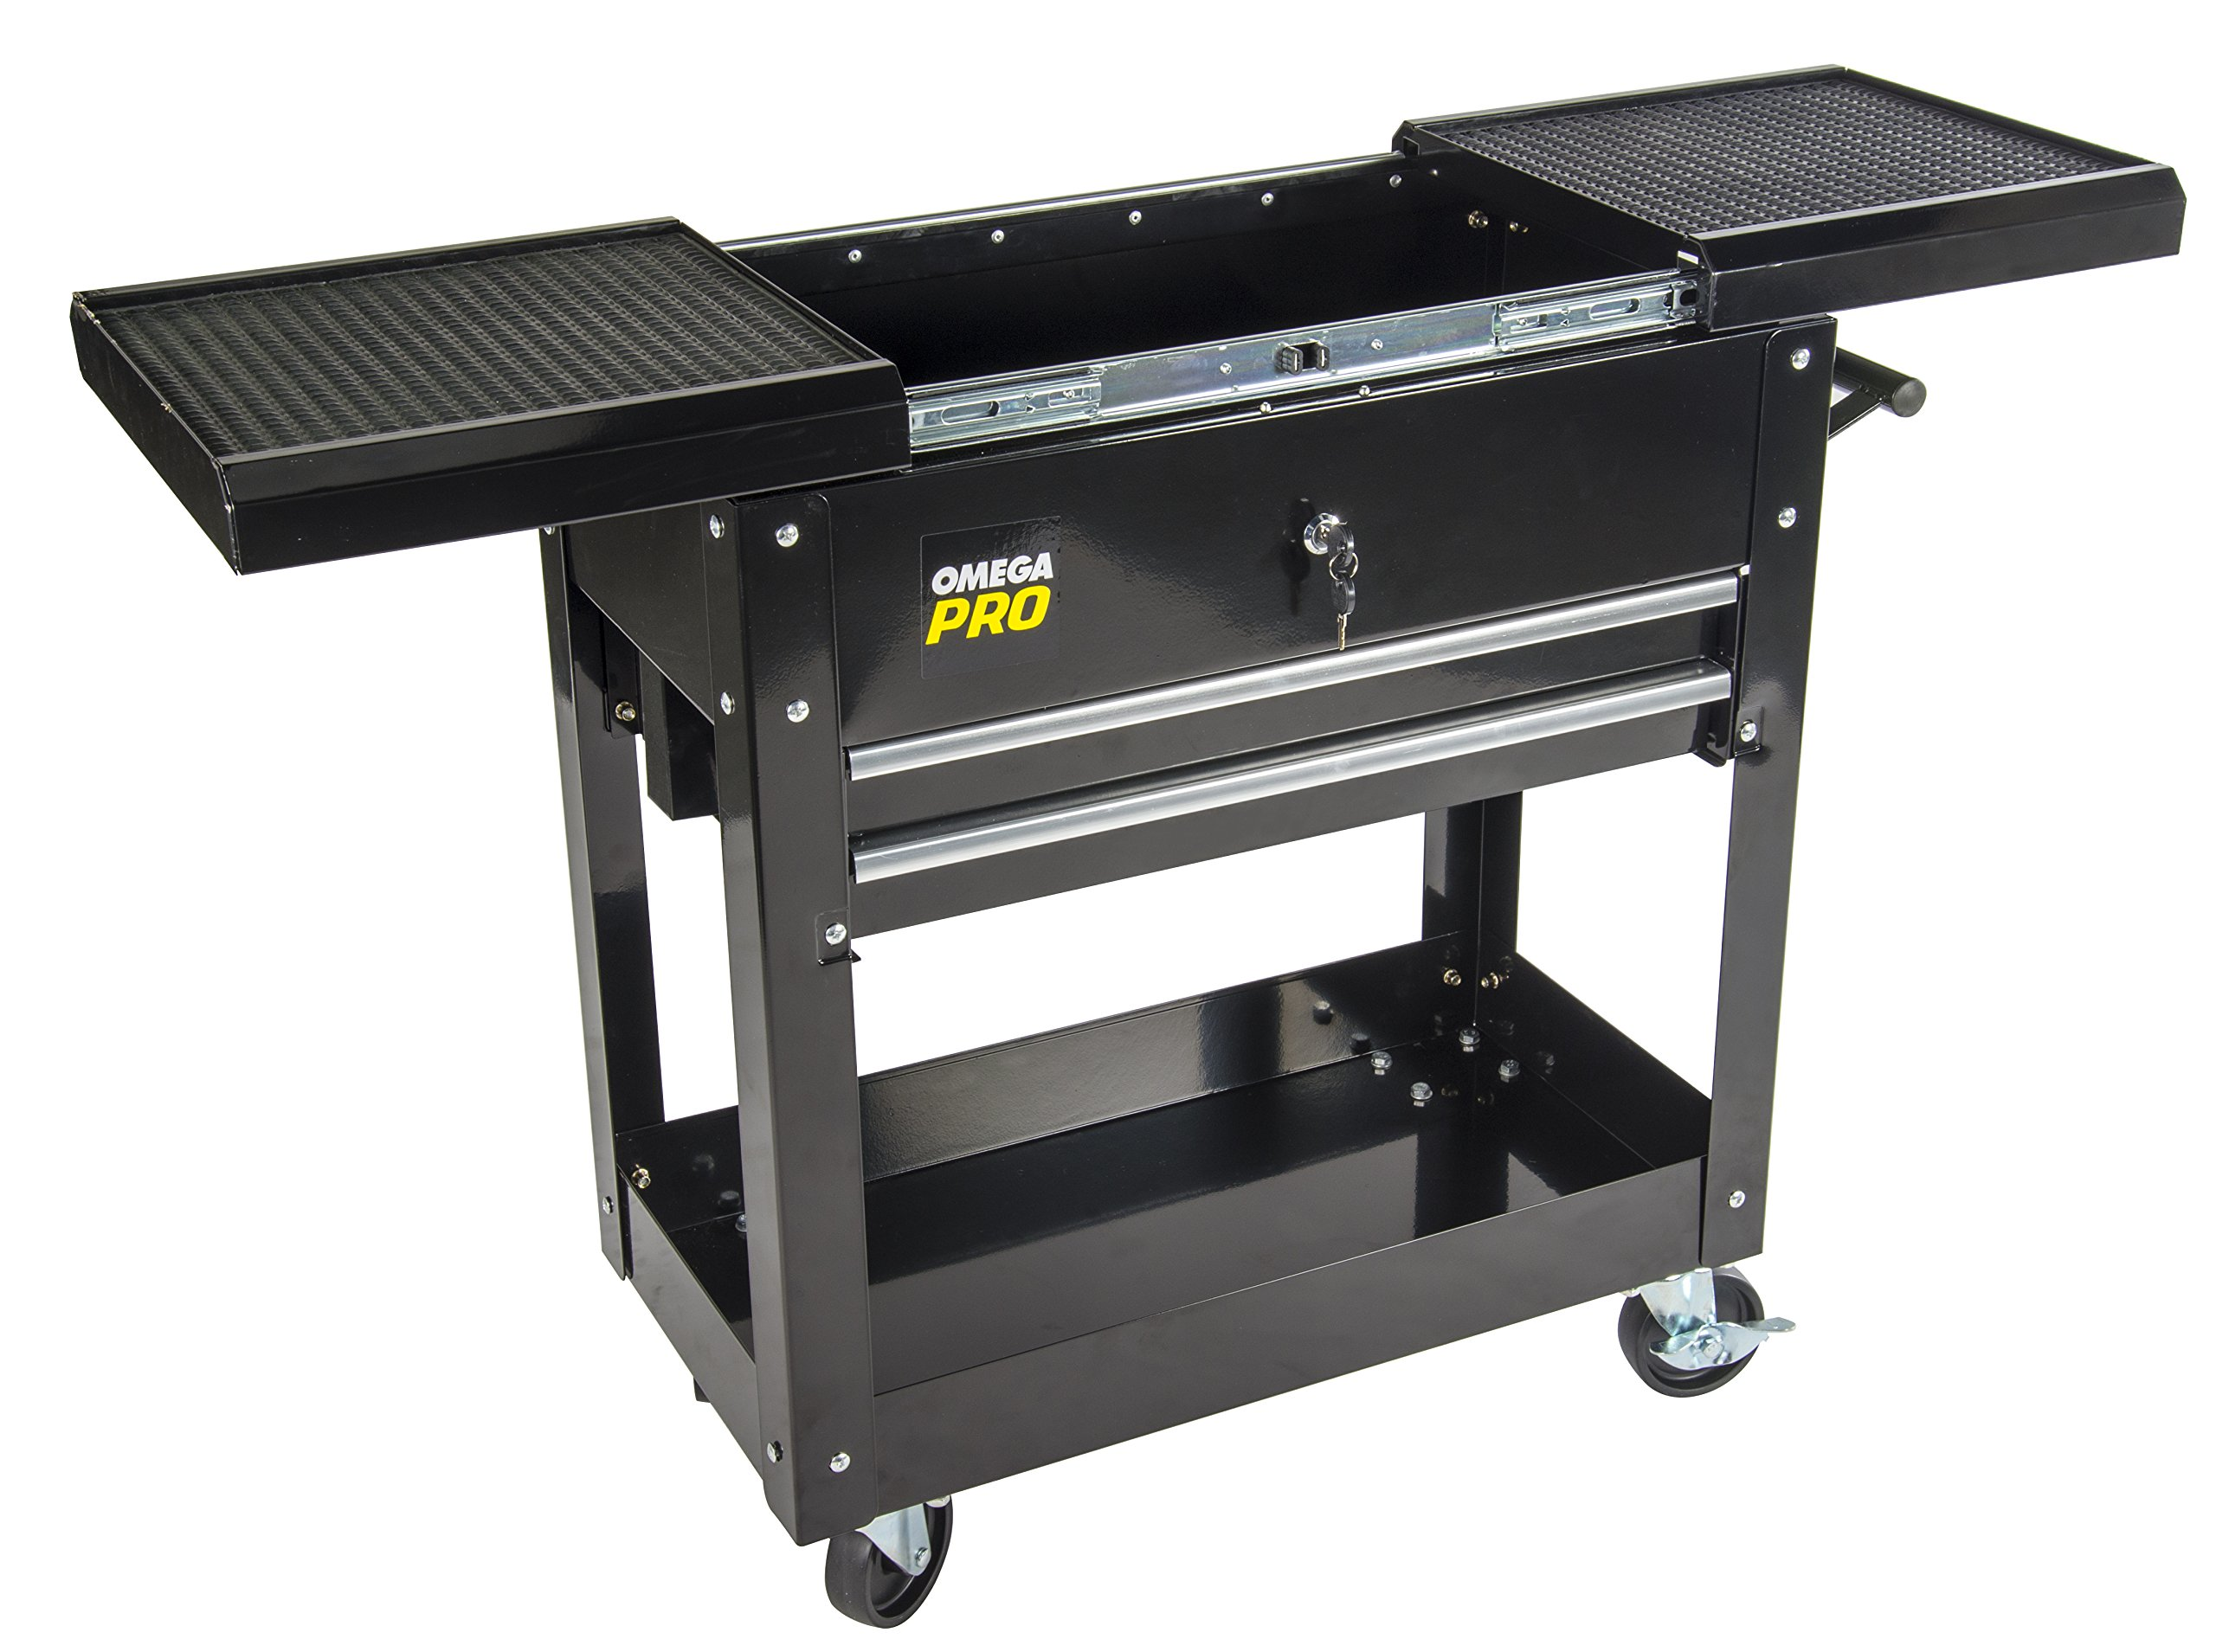 Omega Pro 97431 Omega Pro Heavy Duty Tool Cart, 17.32'' Height, 16.74'' Width, 31.1'' Length by Omega